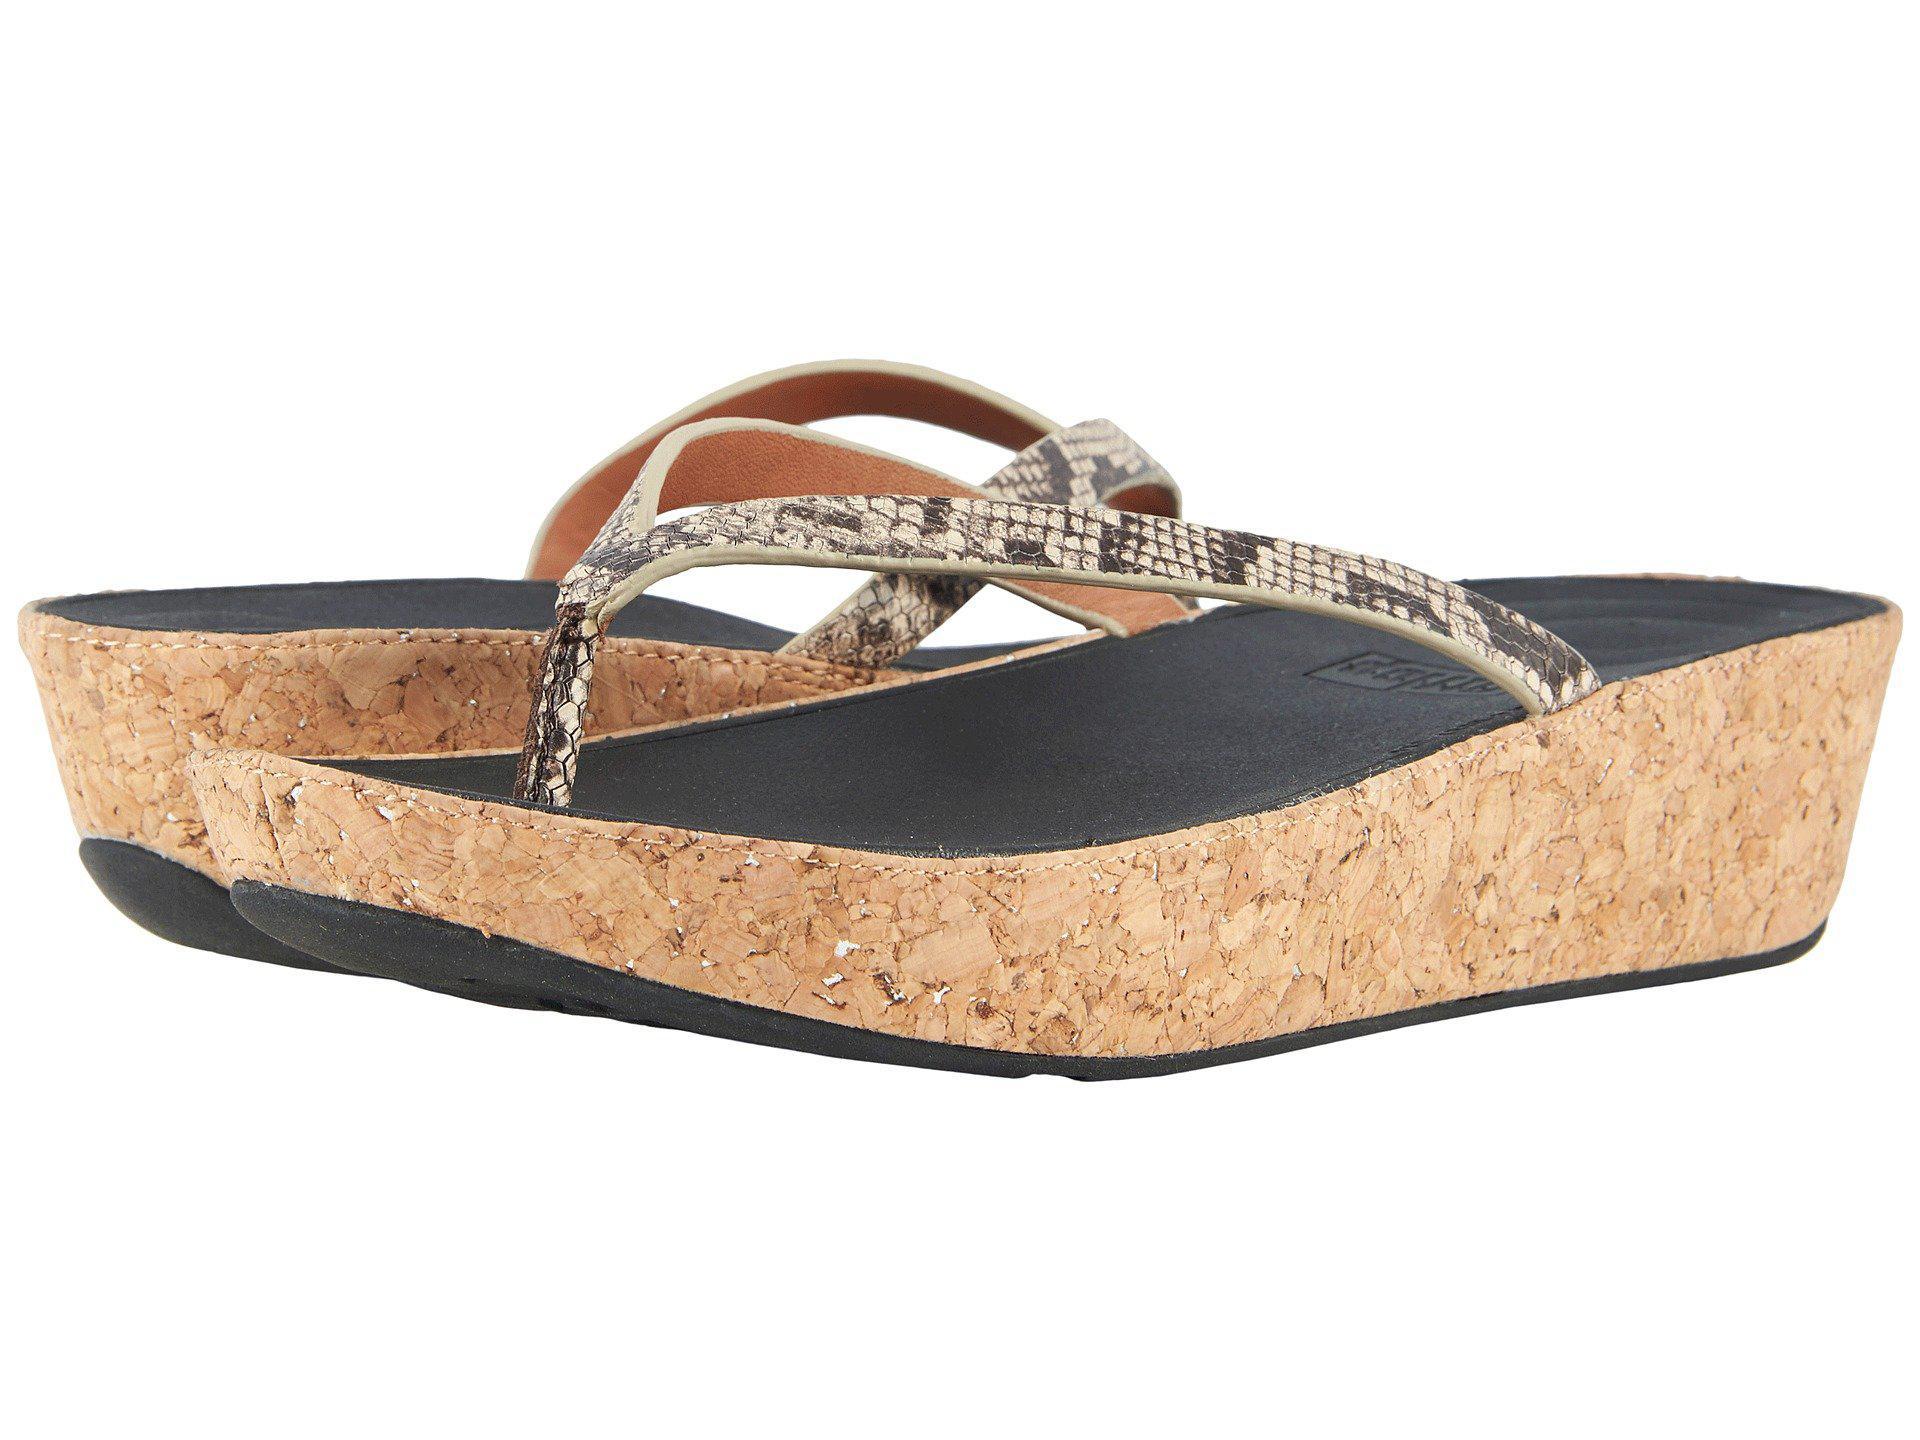 dcd2d5449cd50f Fitflop. Women s Linny Toe Thong Sandals